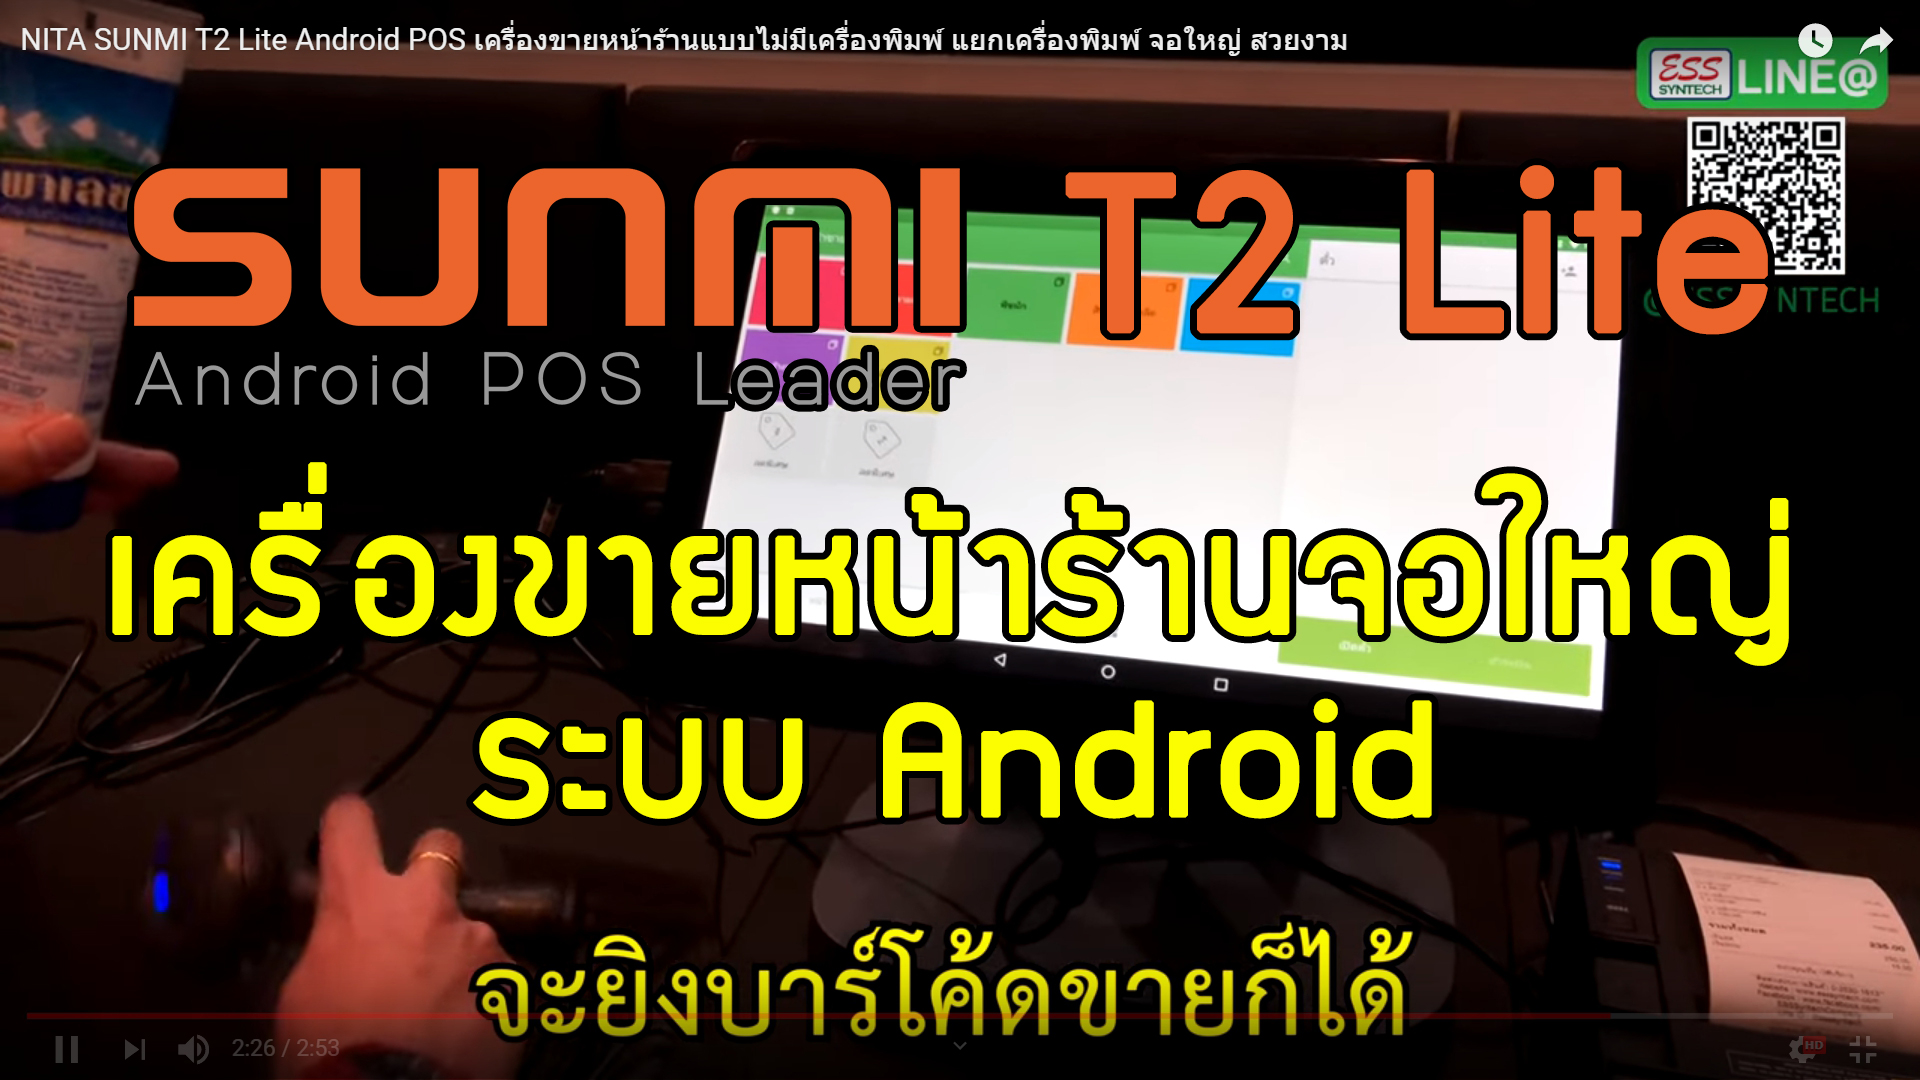 sunmi t2 lite android pos cashier Loyverse pos เครื่องขายหน้าร้าน